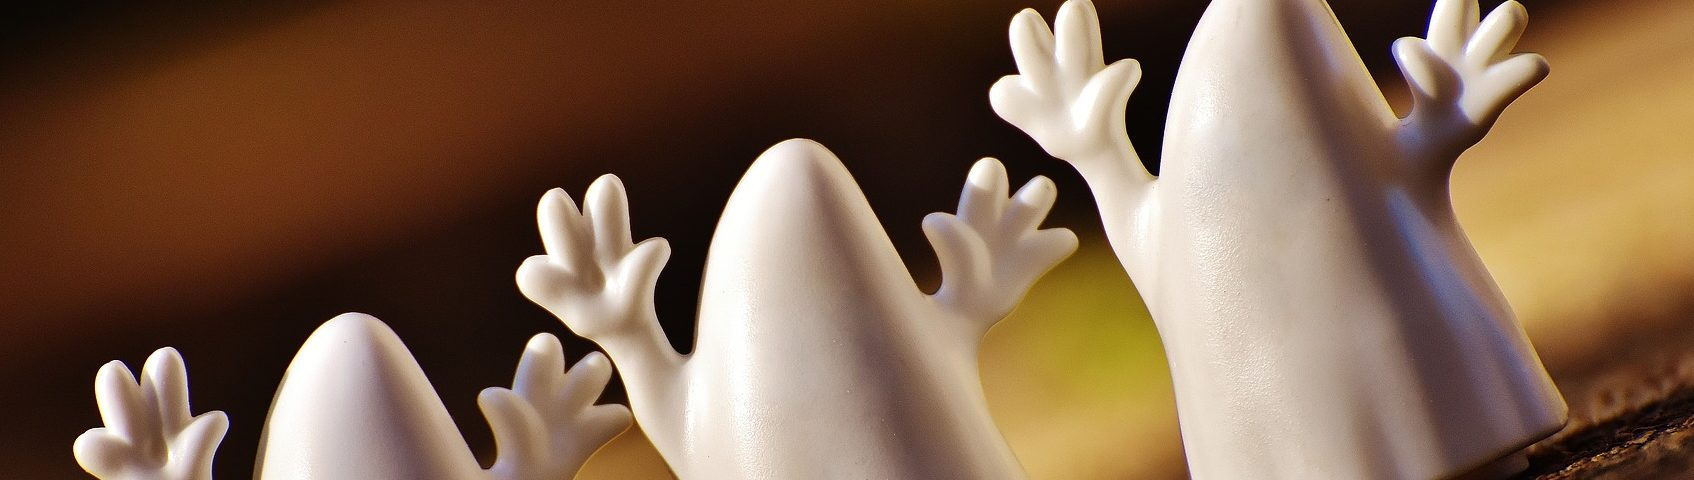 Безе на Хэллоуин